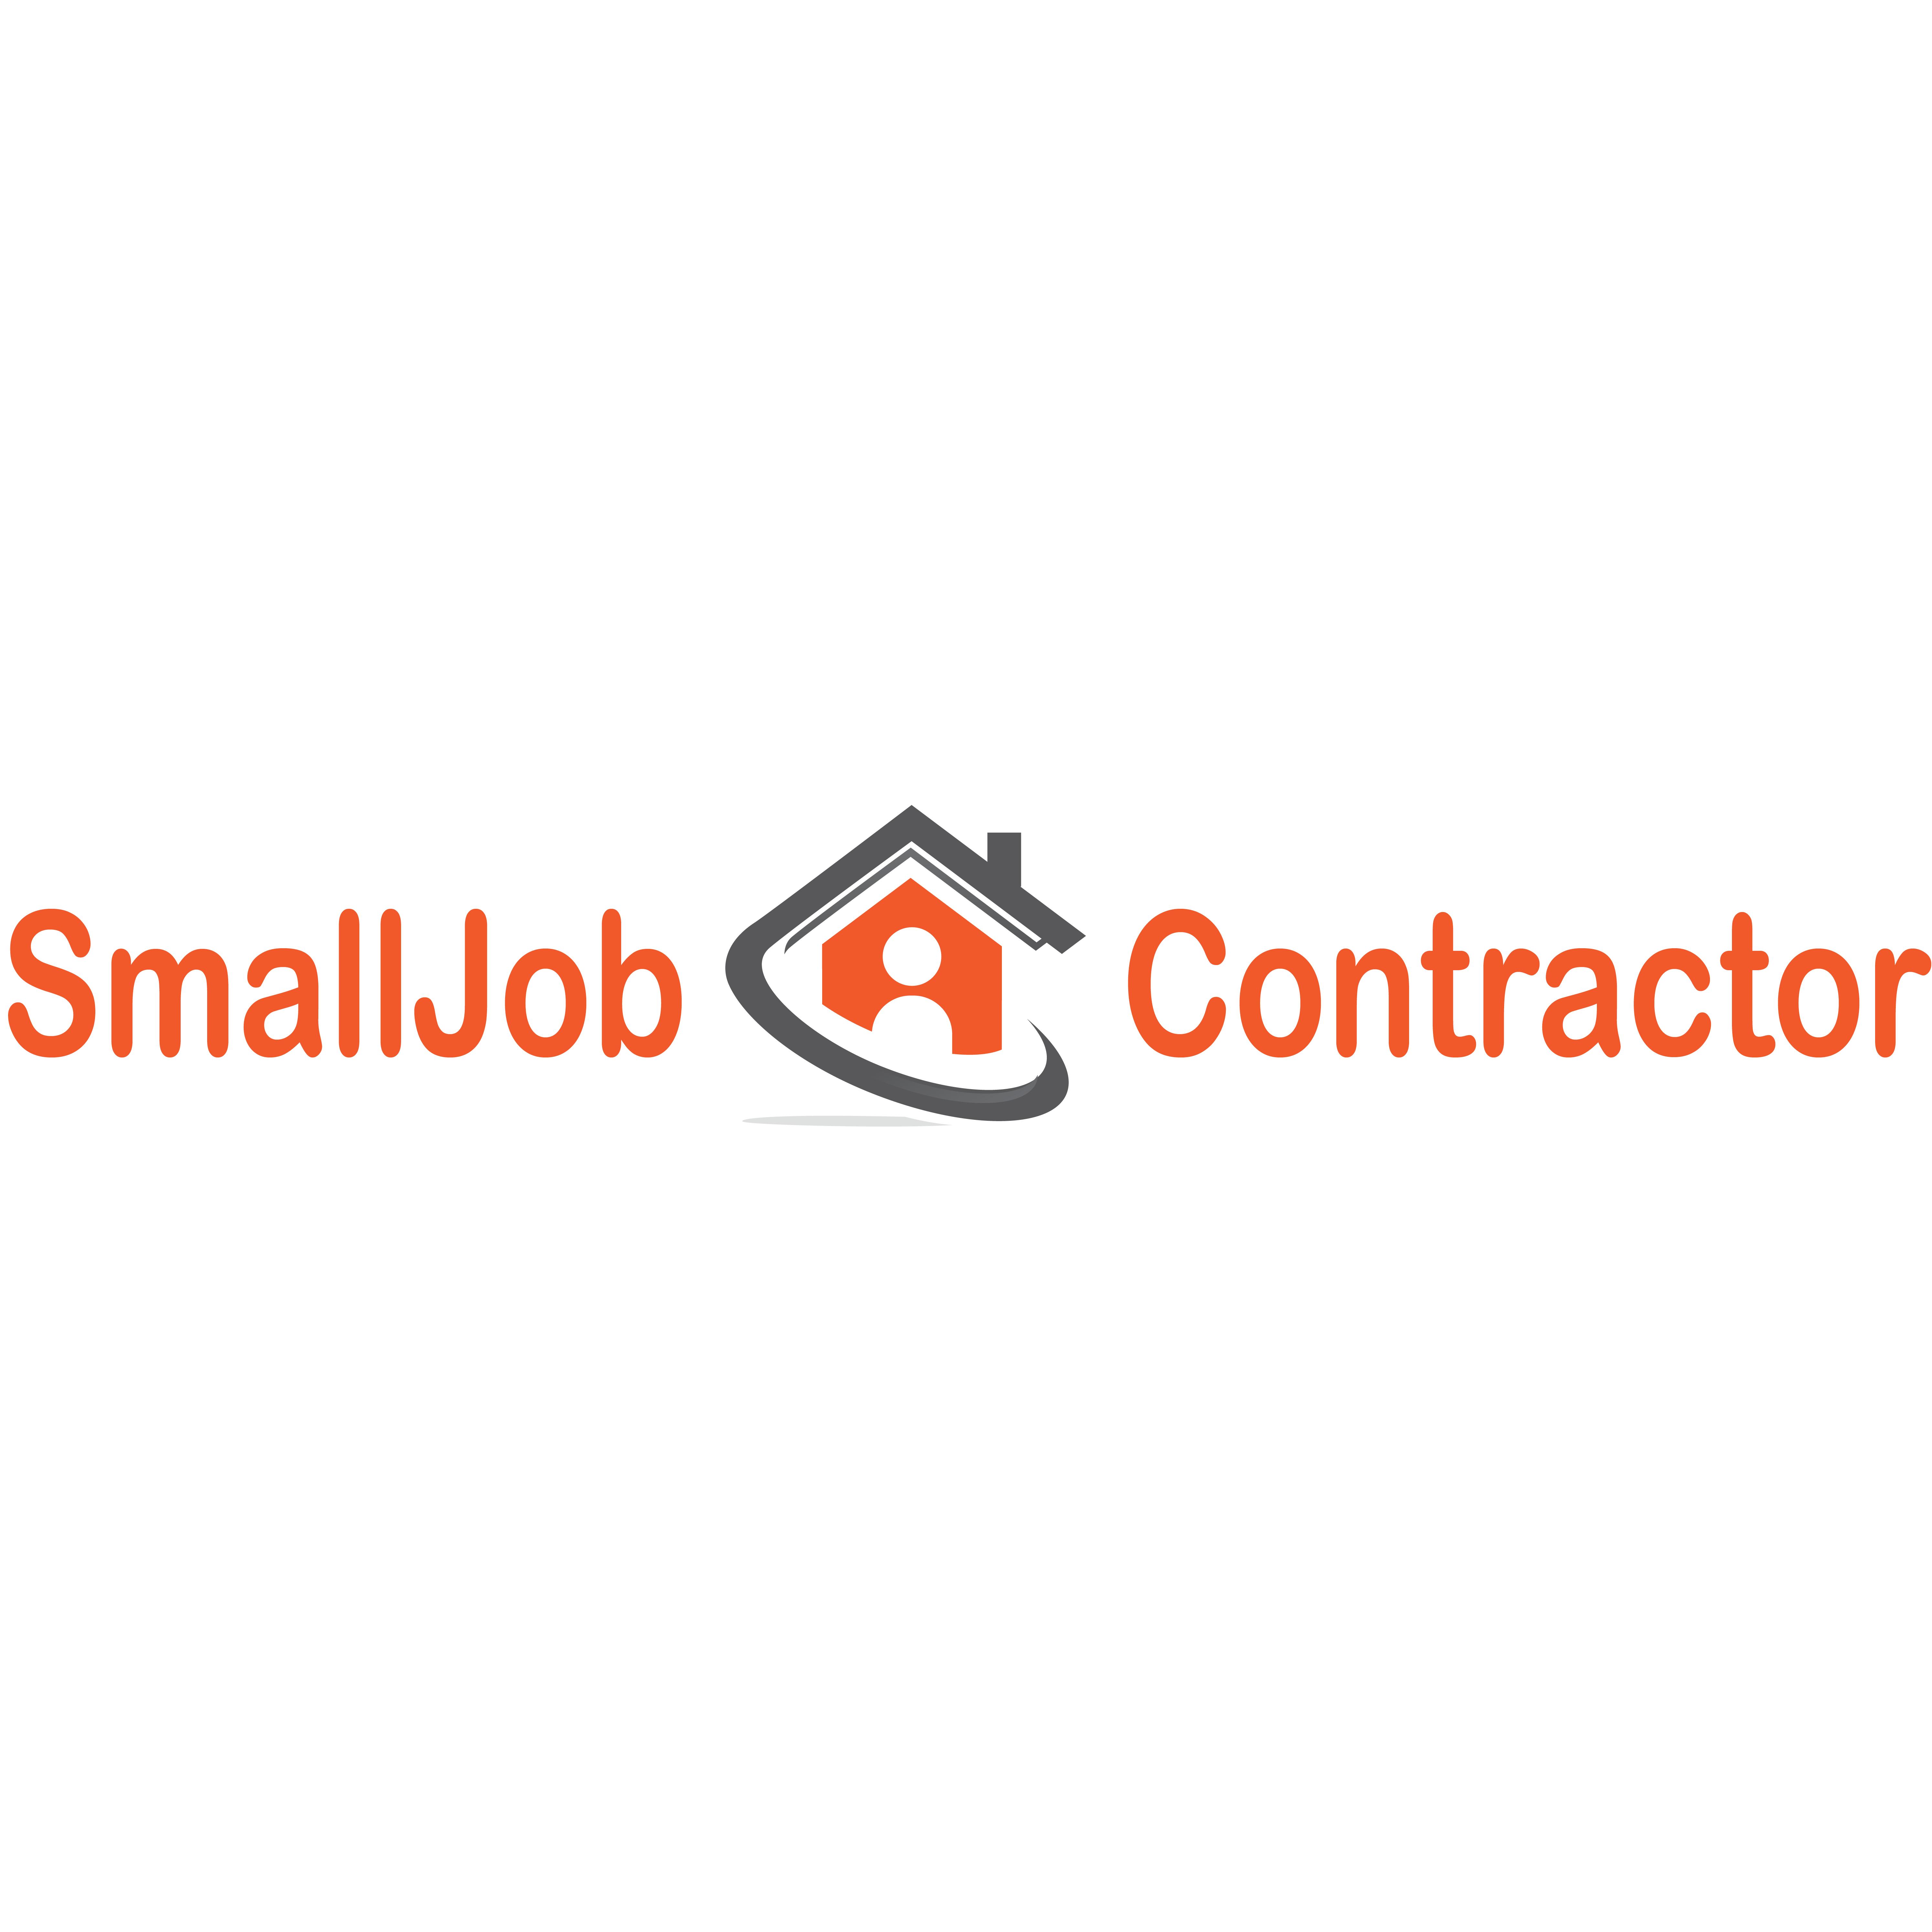 SmallJob Contractor